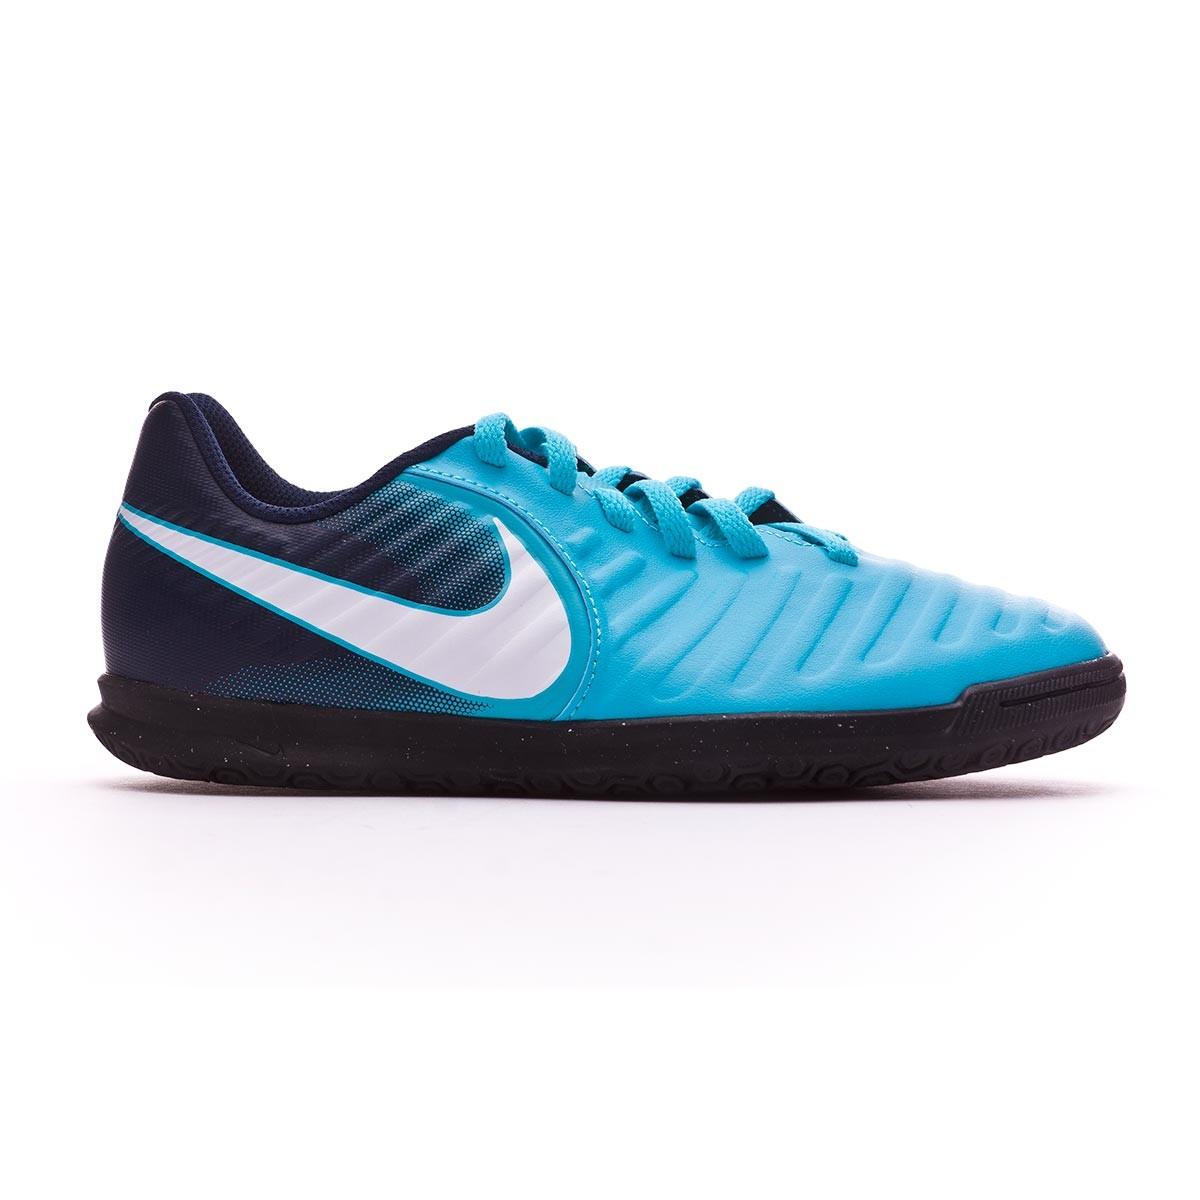 super popular a9164 45739 Chaussure de futsal Nike Jr TiempoX Rio IV IC Gamma  blue-White-Obsidian-Glacier blue - Boutique de football Fútbol Emotion